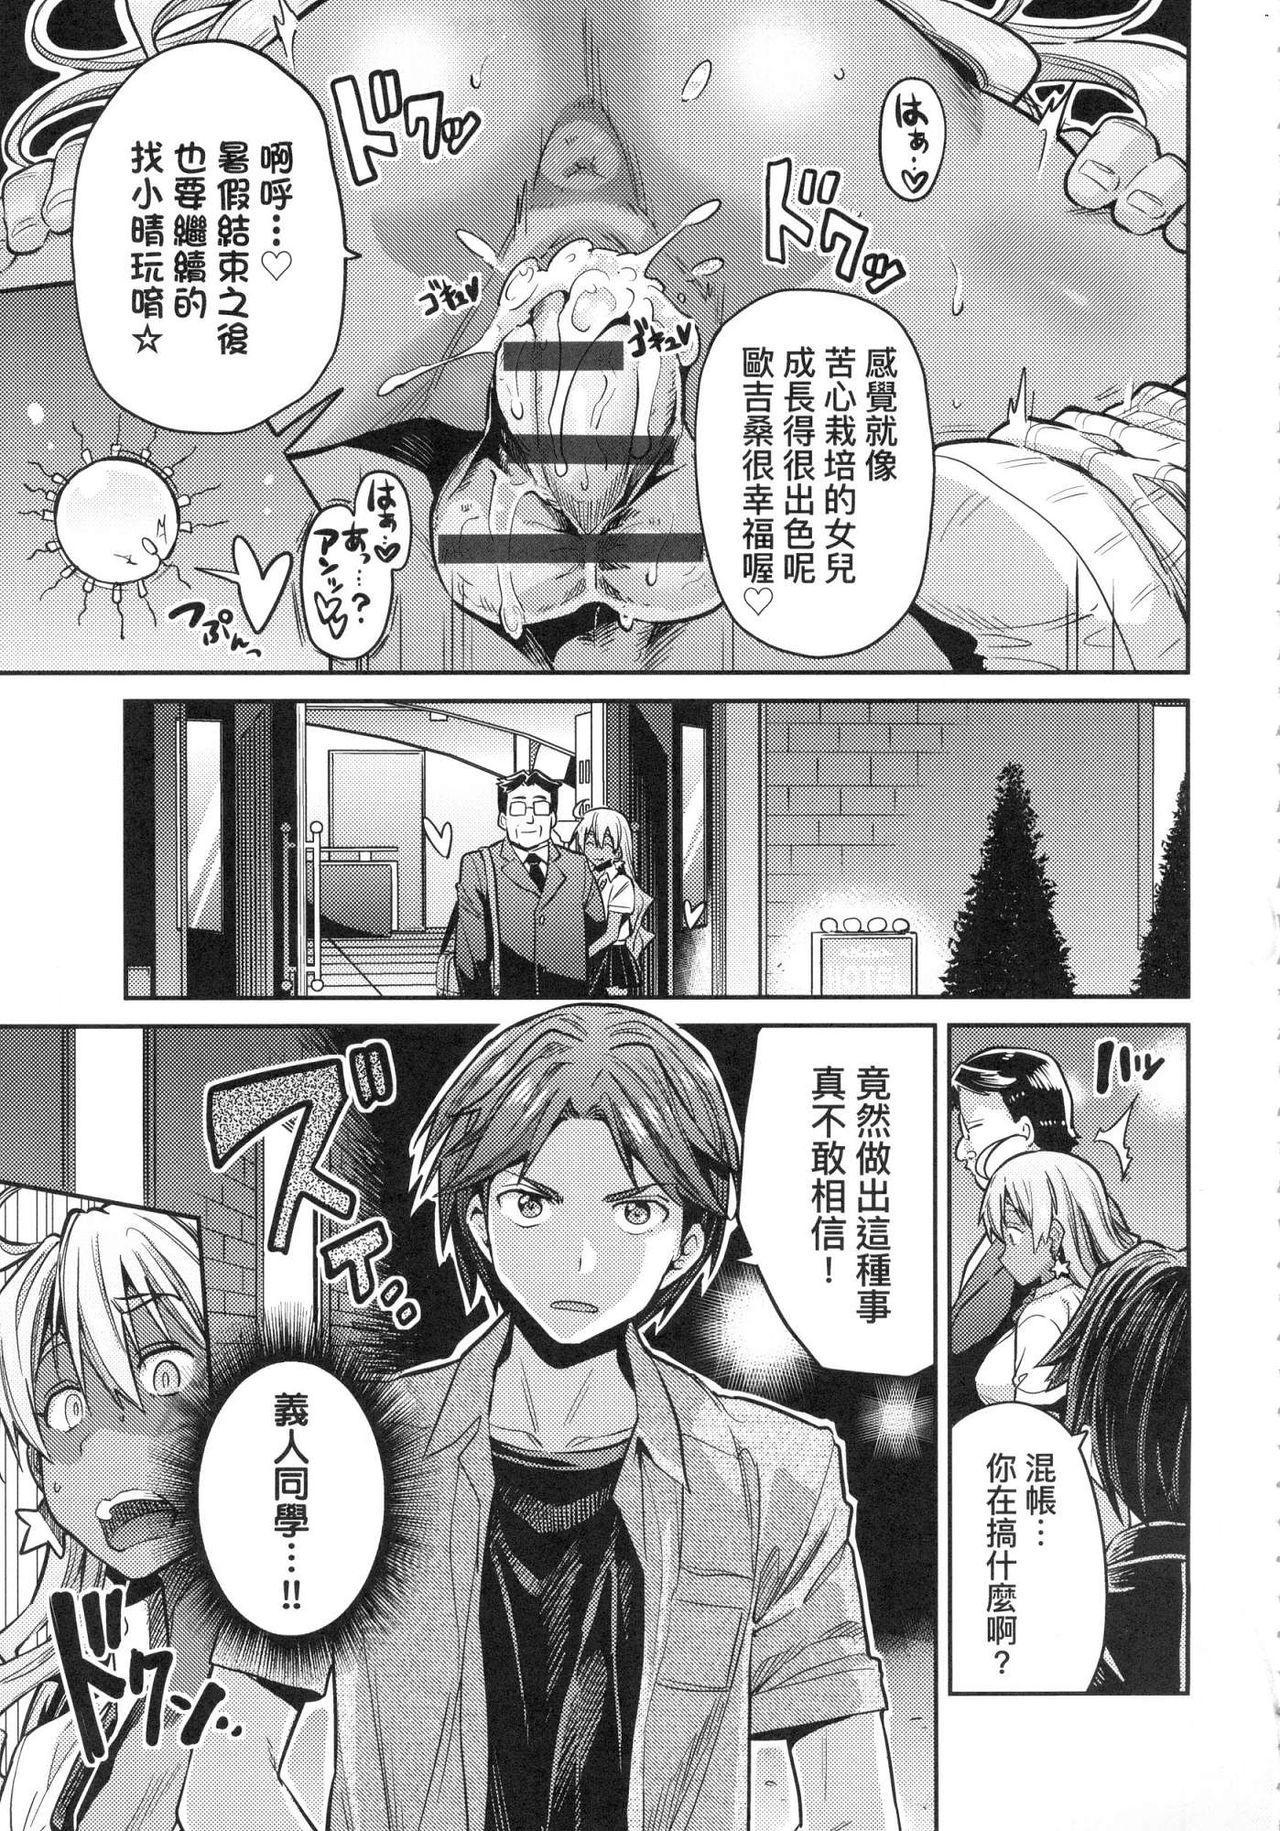 Kyousei Tanetsuke Express - Forced Seeding Express 154